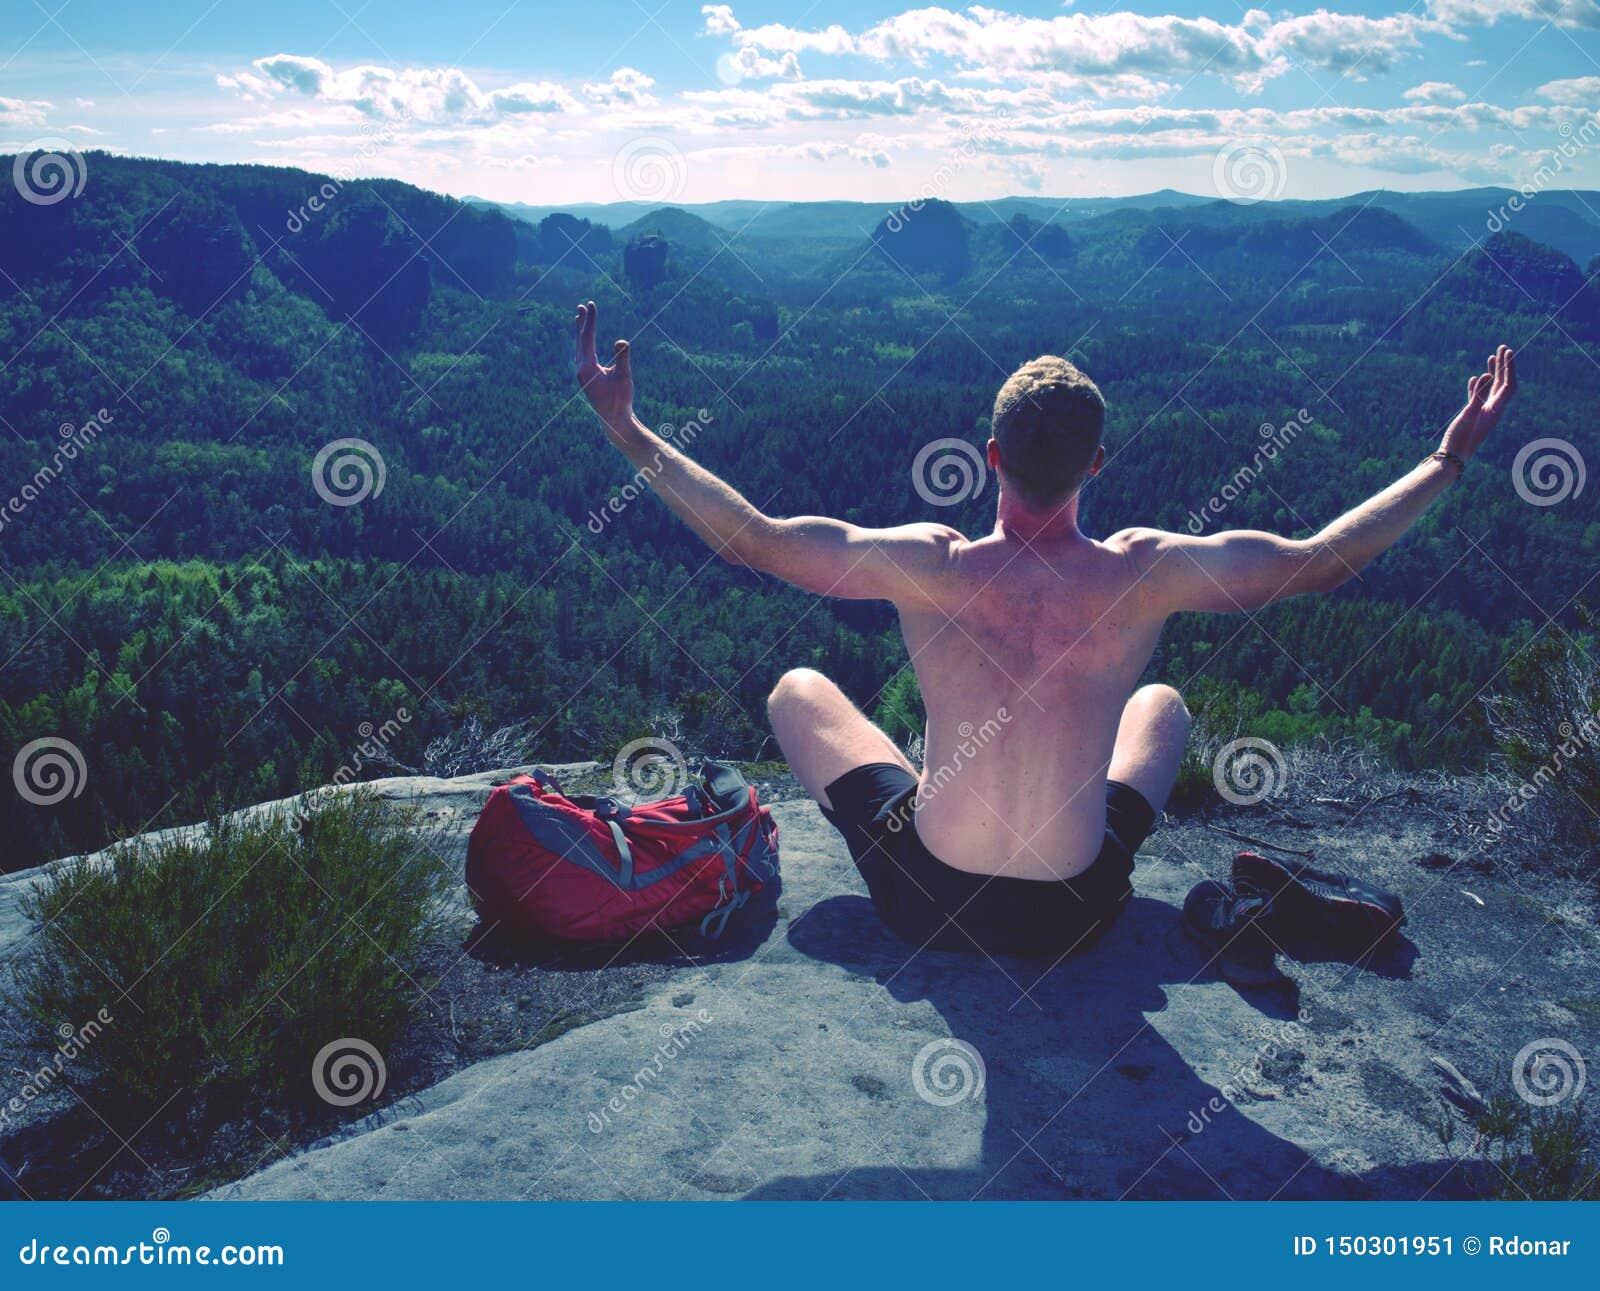 Shirtless mensen ontspannende meditatie met rustige meningsbergen